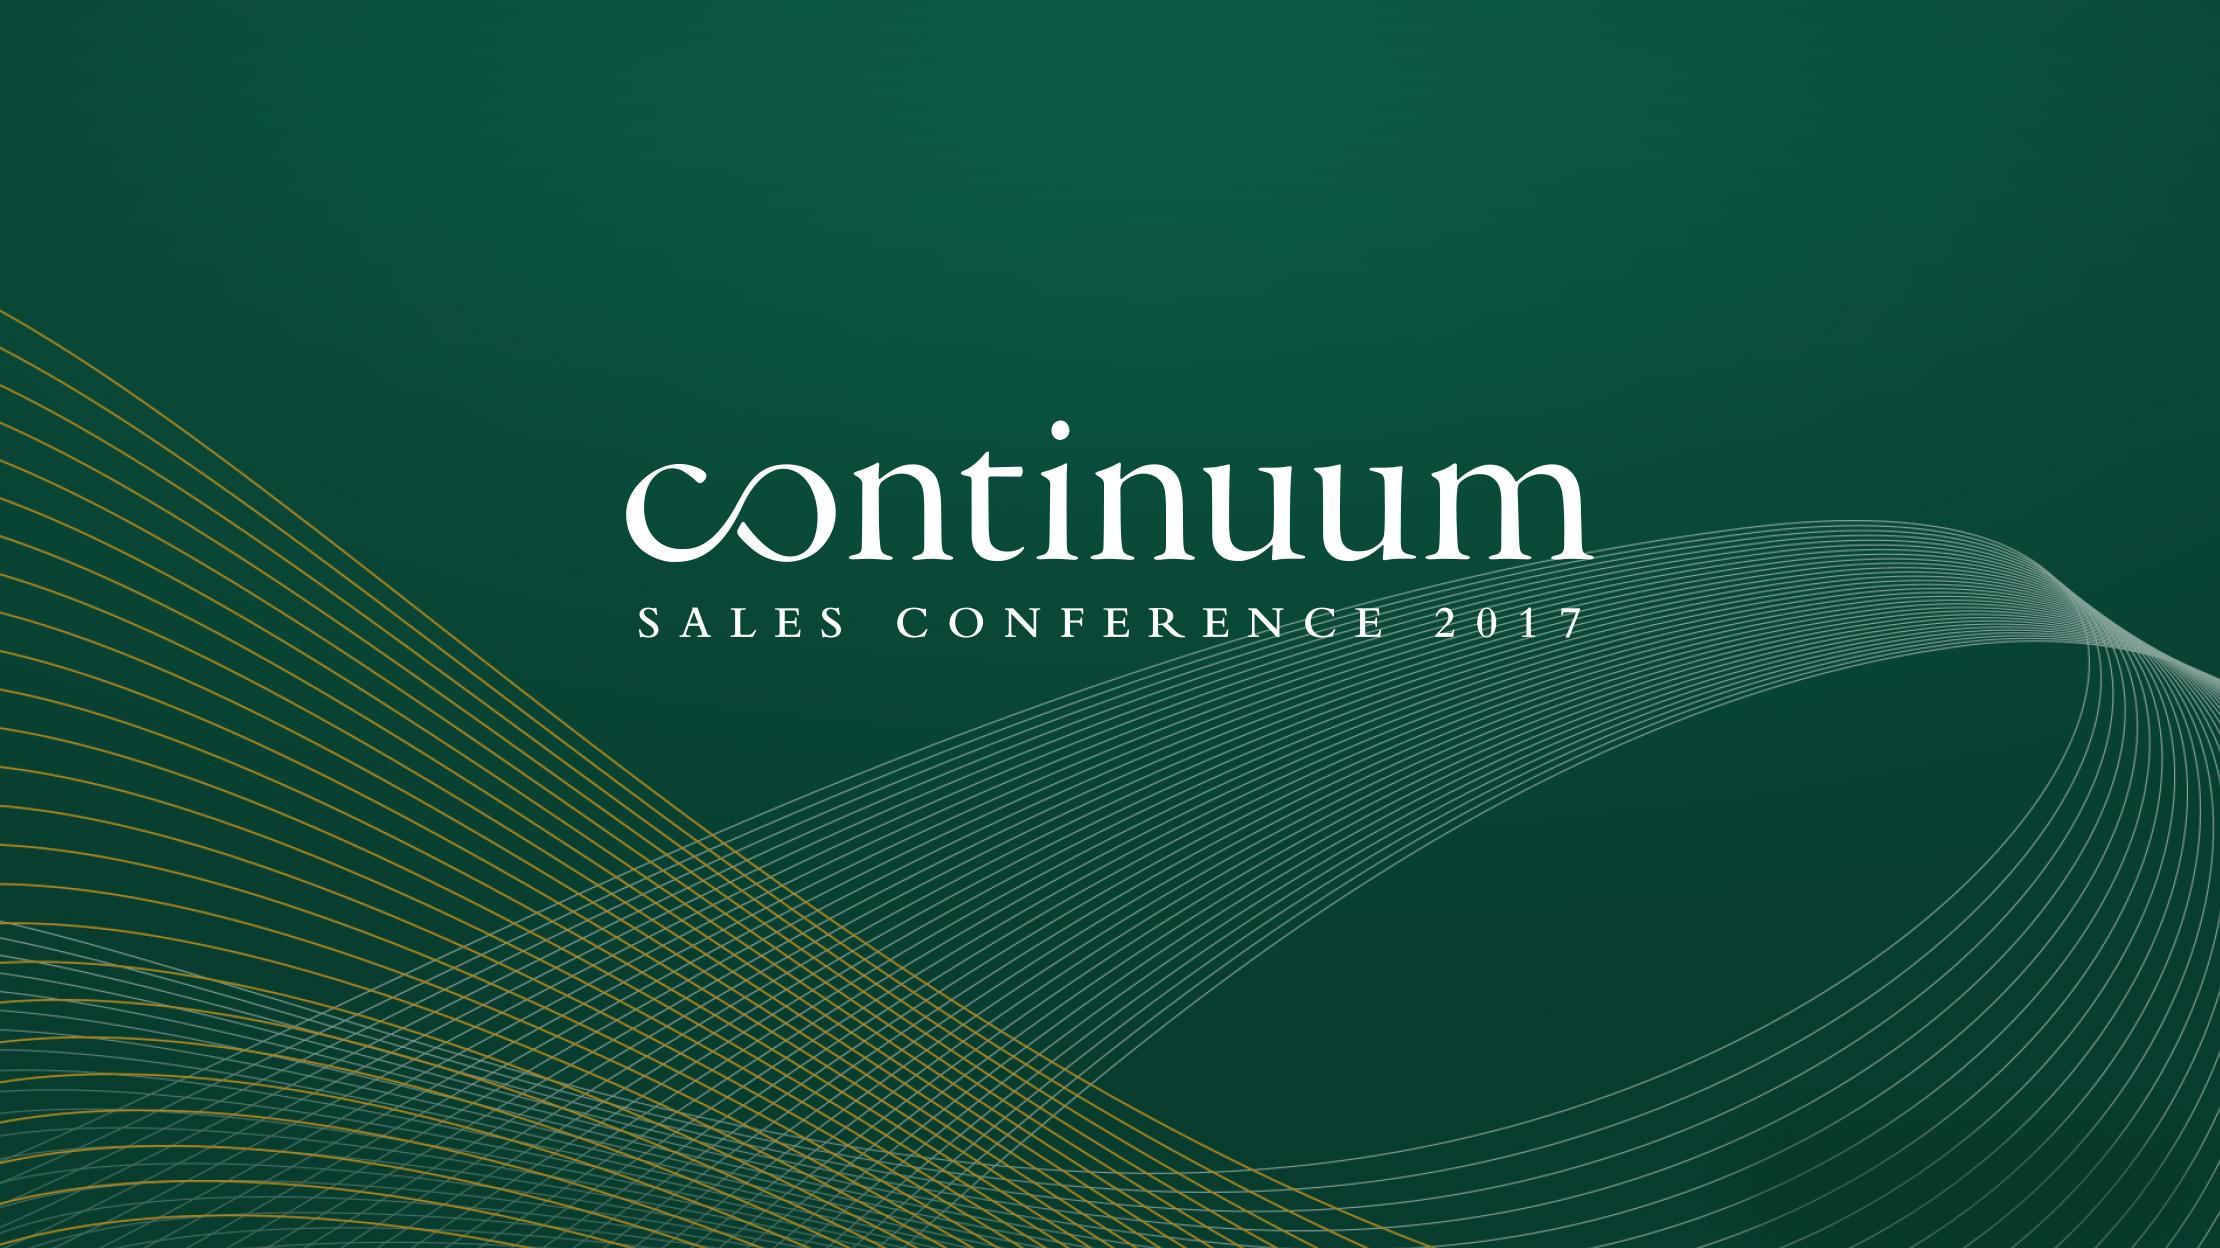 continuum_presentation.jpg